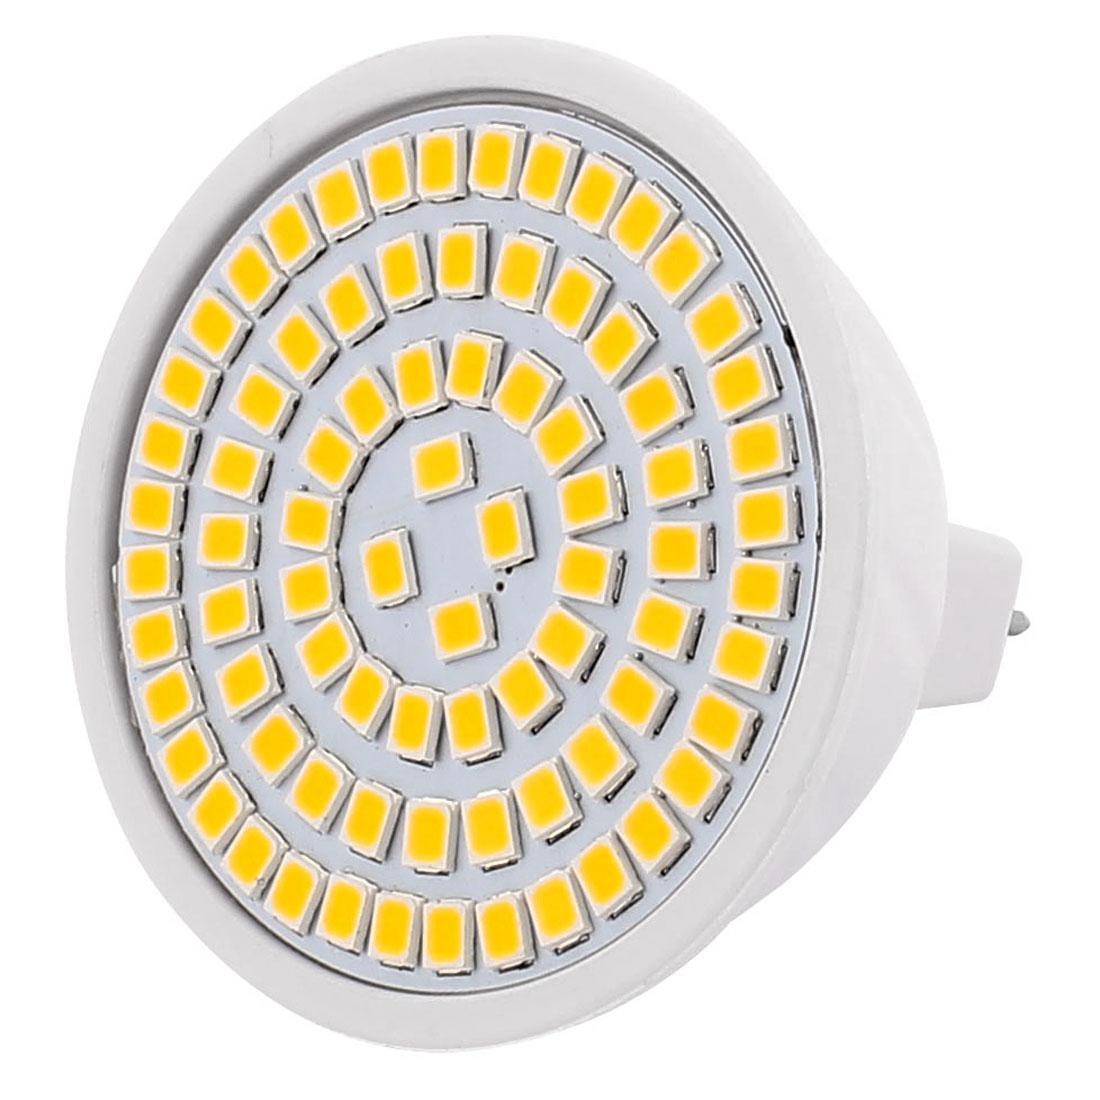 MR16 SMD 2835 80 LEDs Plastic Energy-Saving LED Lamp Bulb Warm White AC 110V 8W